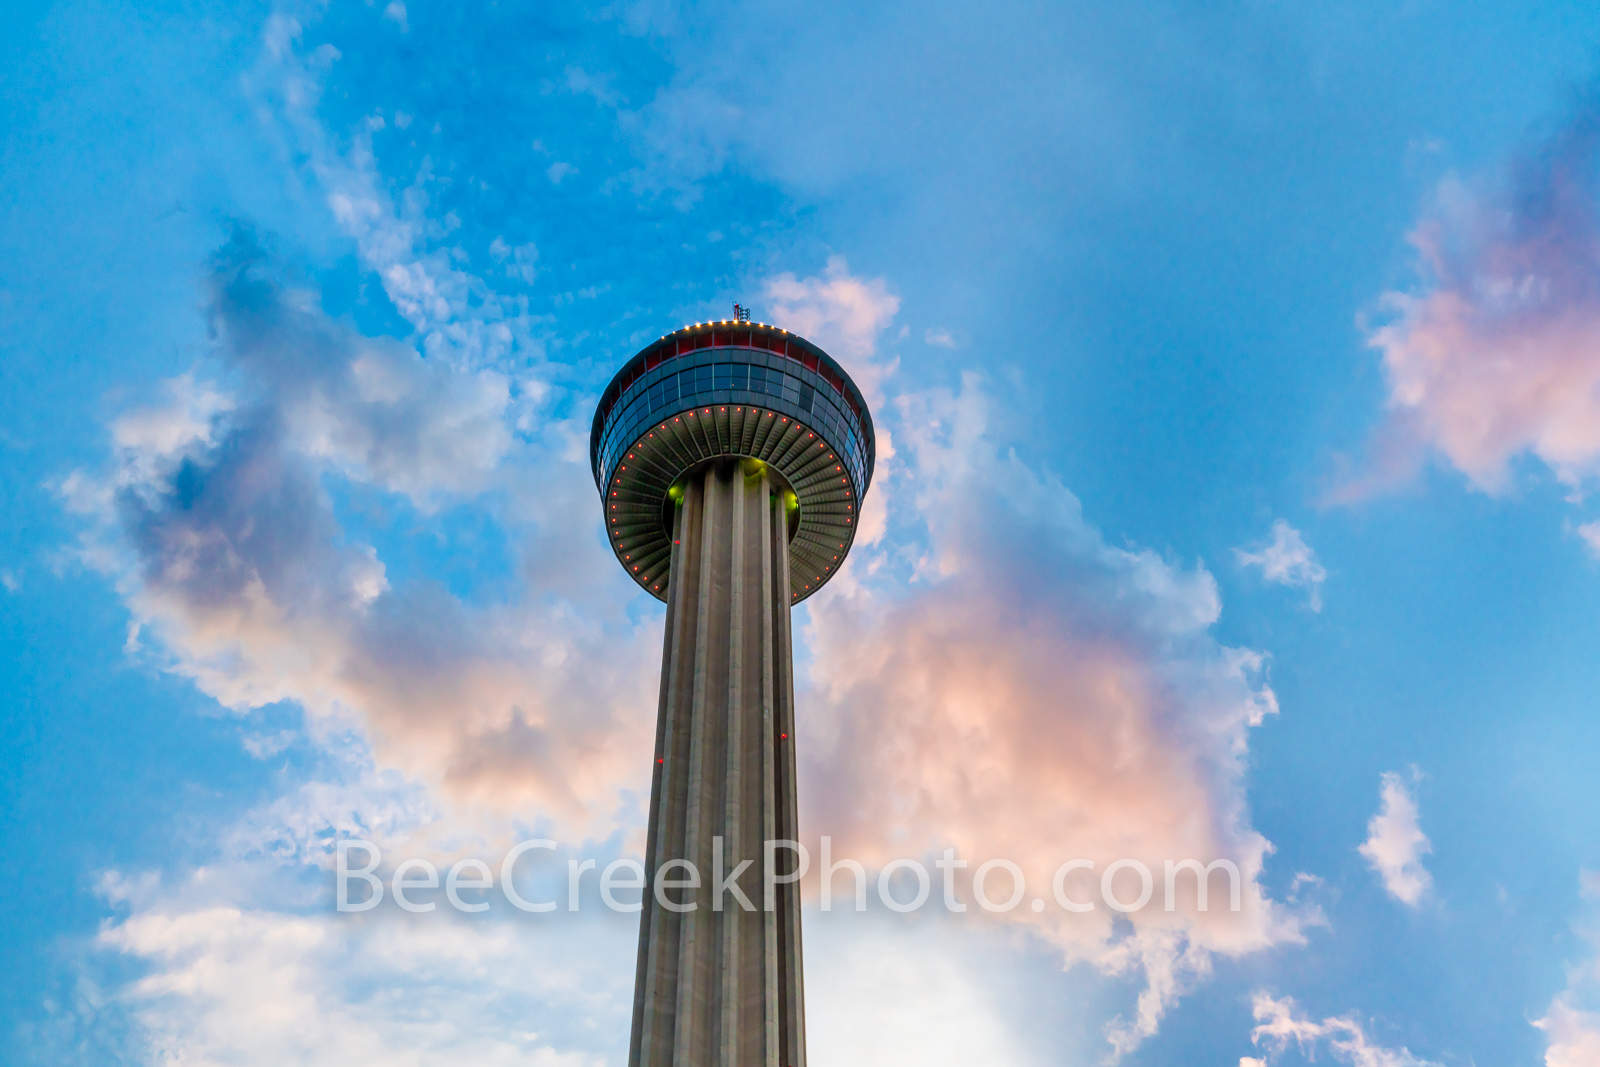 san antonio, tower of americas, downtown, san antonio, observation tower, restaurant, hemisfair, downtown san antonio, san antonio texas, world fair, city of san antonio, tourist, , photo